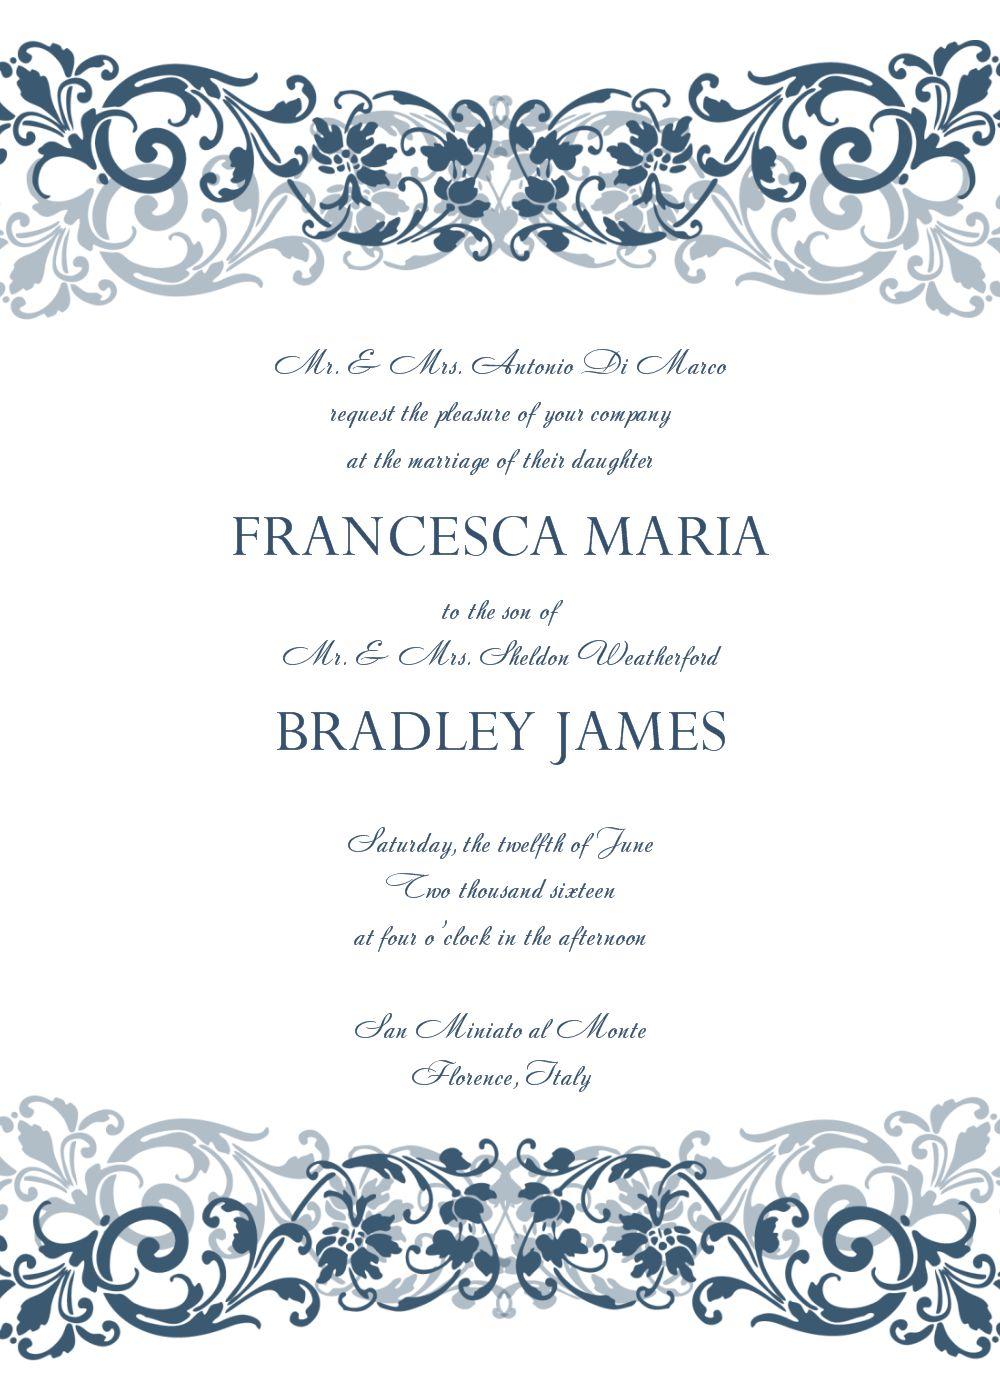 invitation card : Free Photo Invitation Templates.